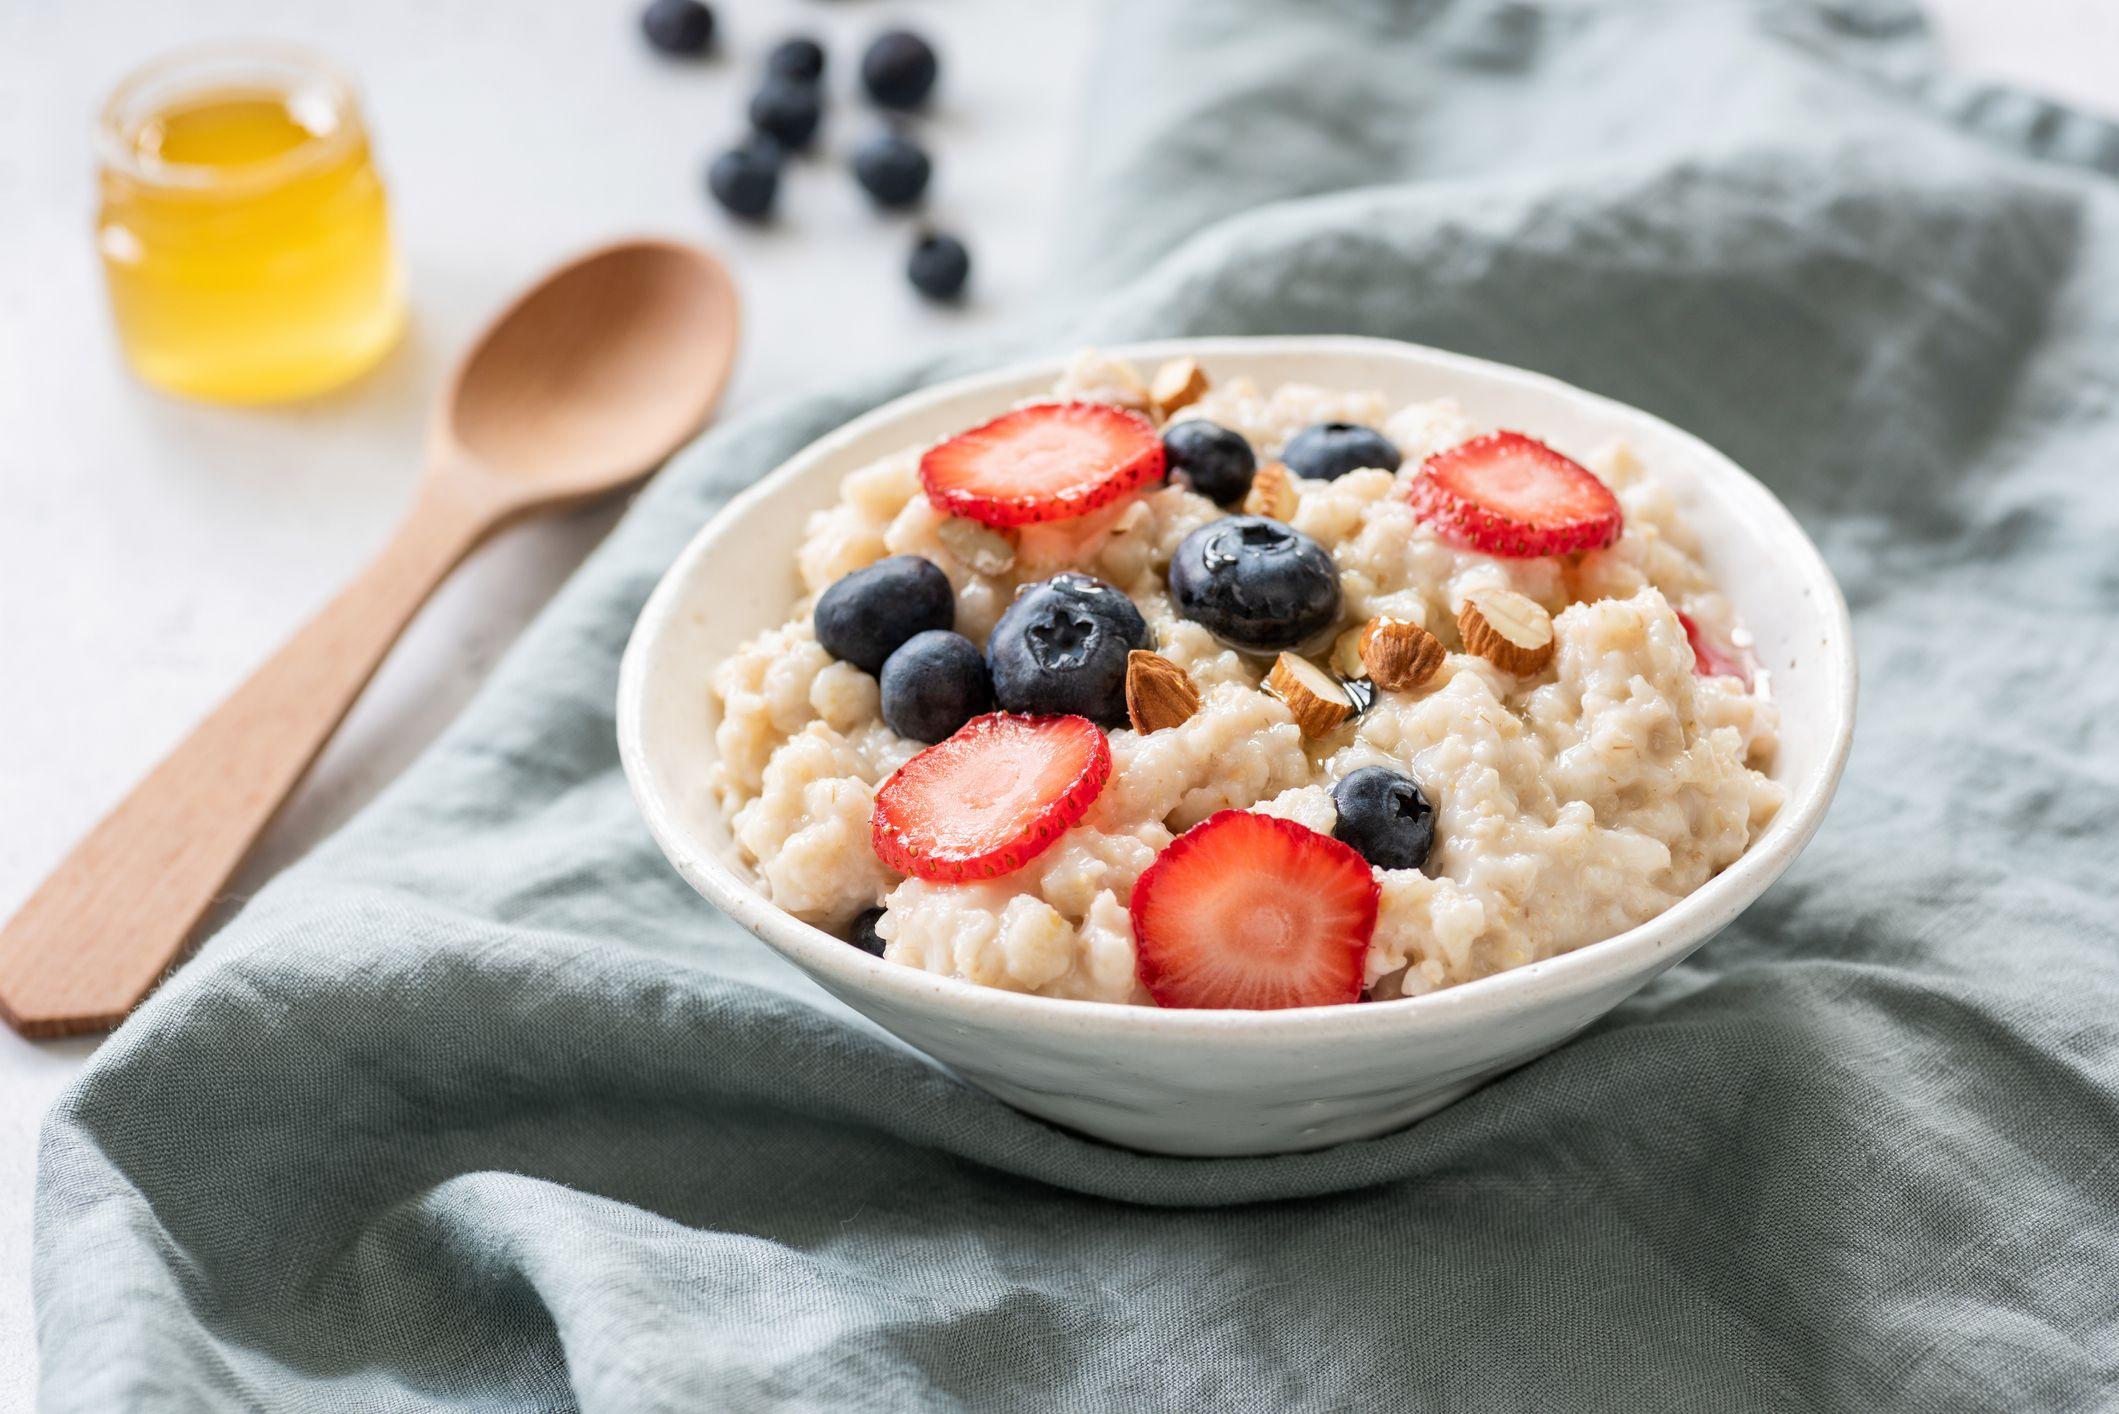 най-добрите идеи за диабетна закуска ягодоплодни овесени ядки